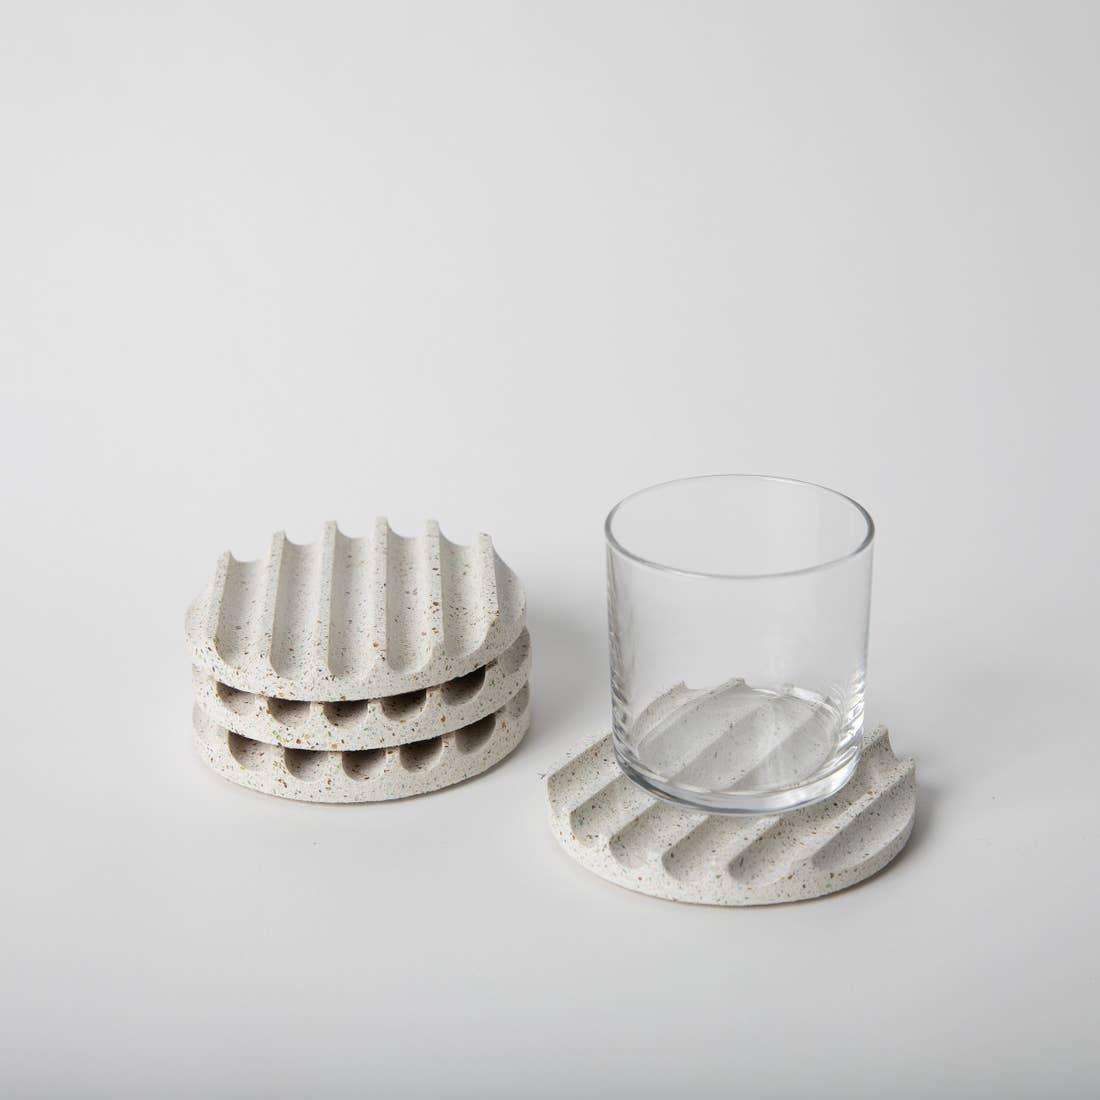 Image of Concrete Terrazzo Coasters + color options